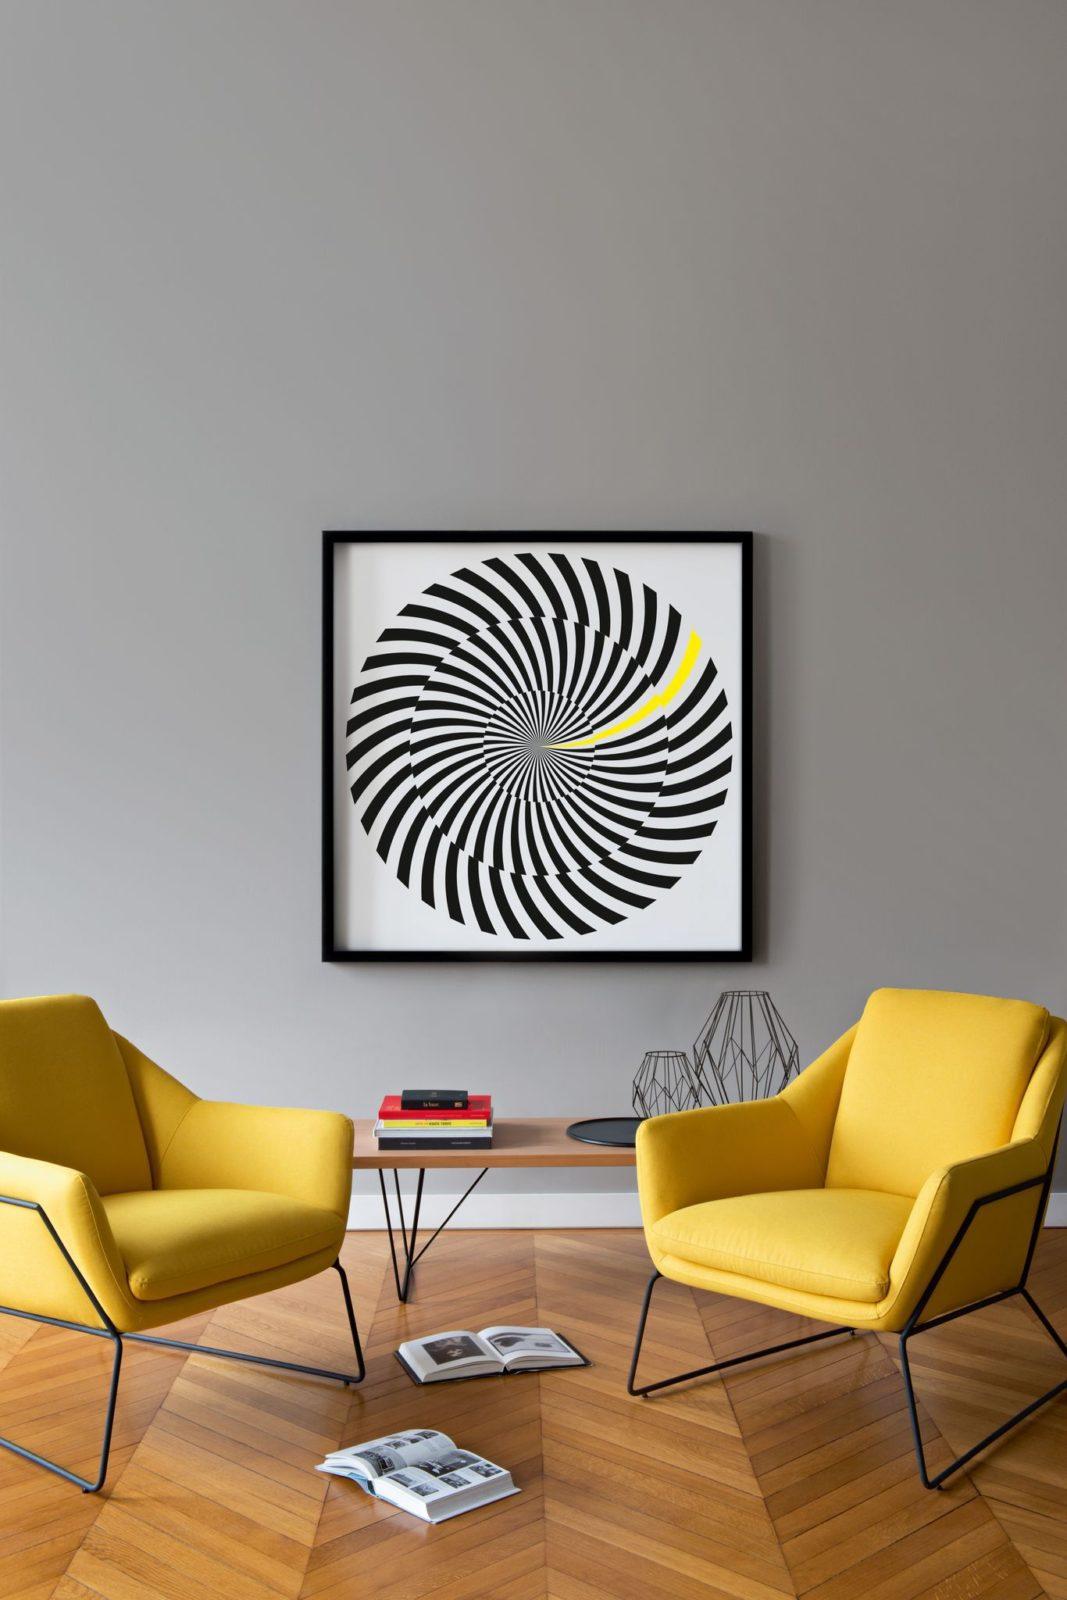 salon mur gris fauteuils jaunes